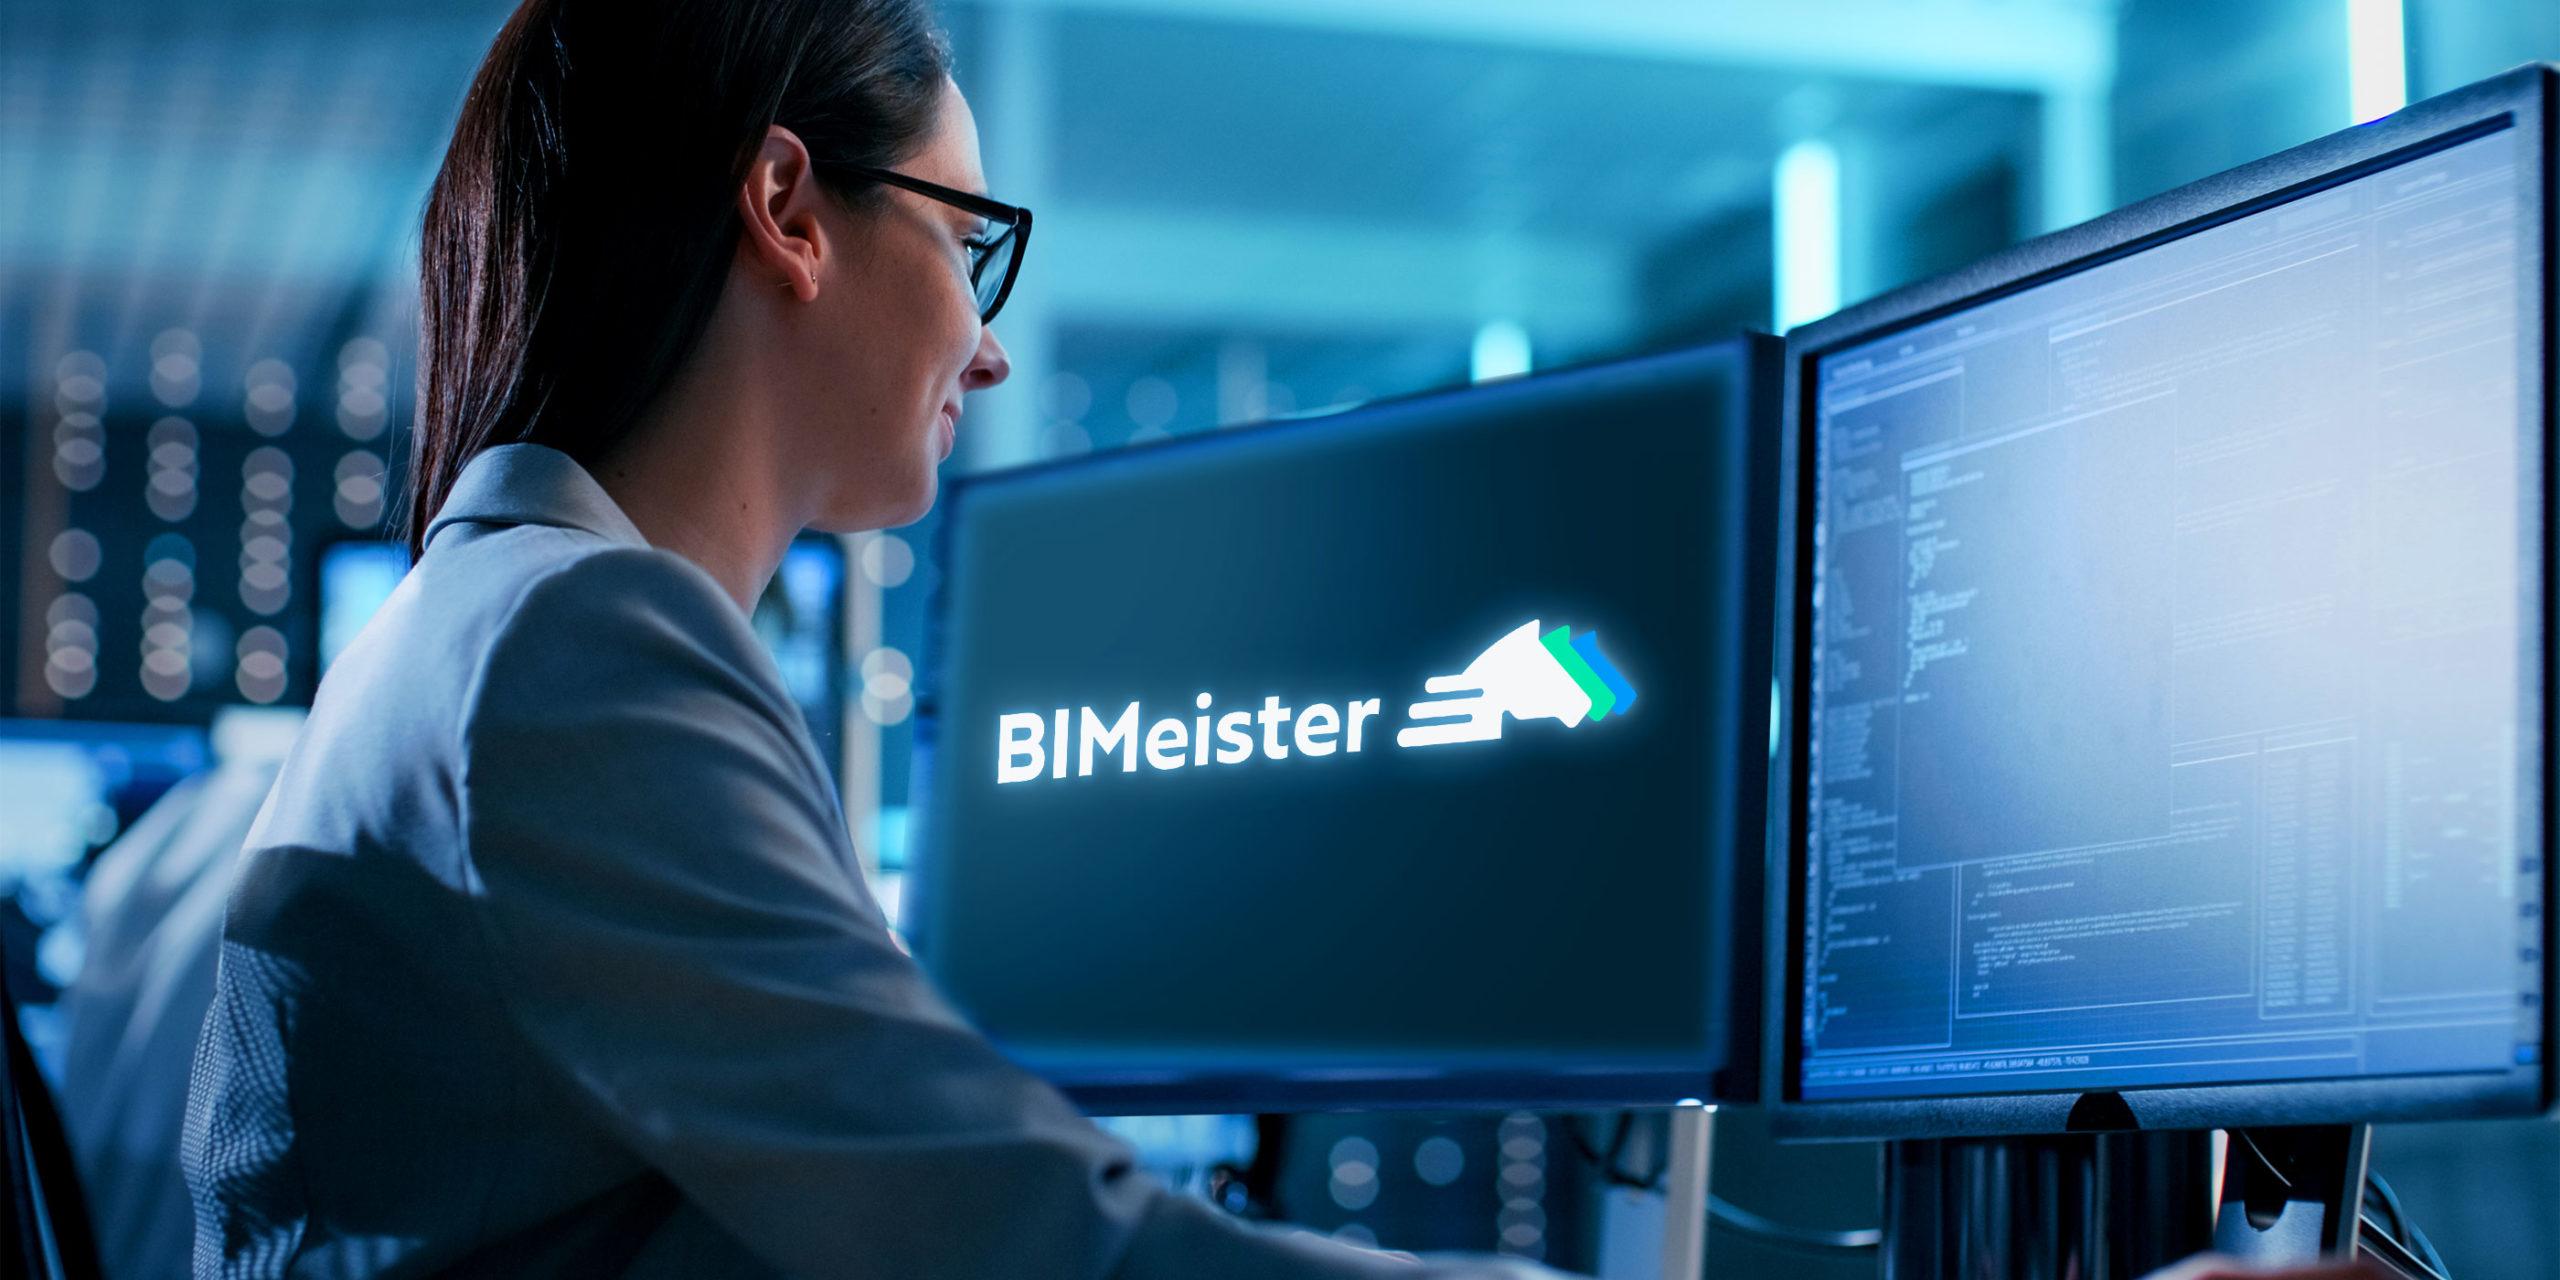 Bimeister